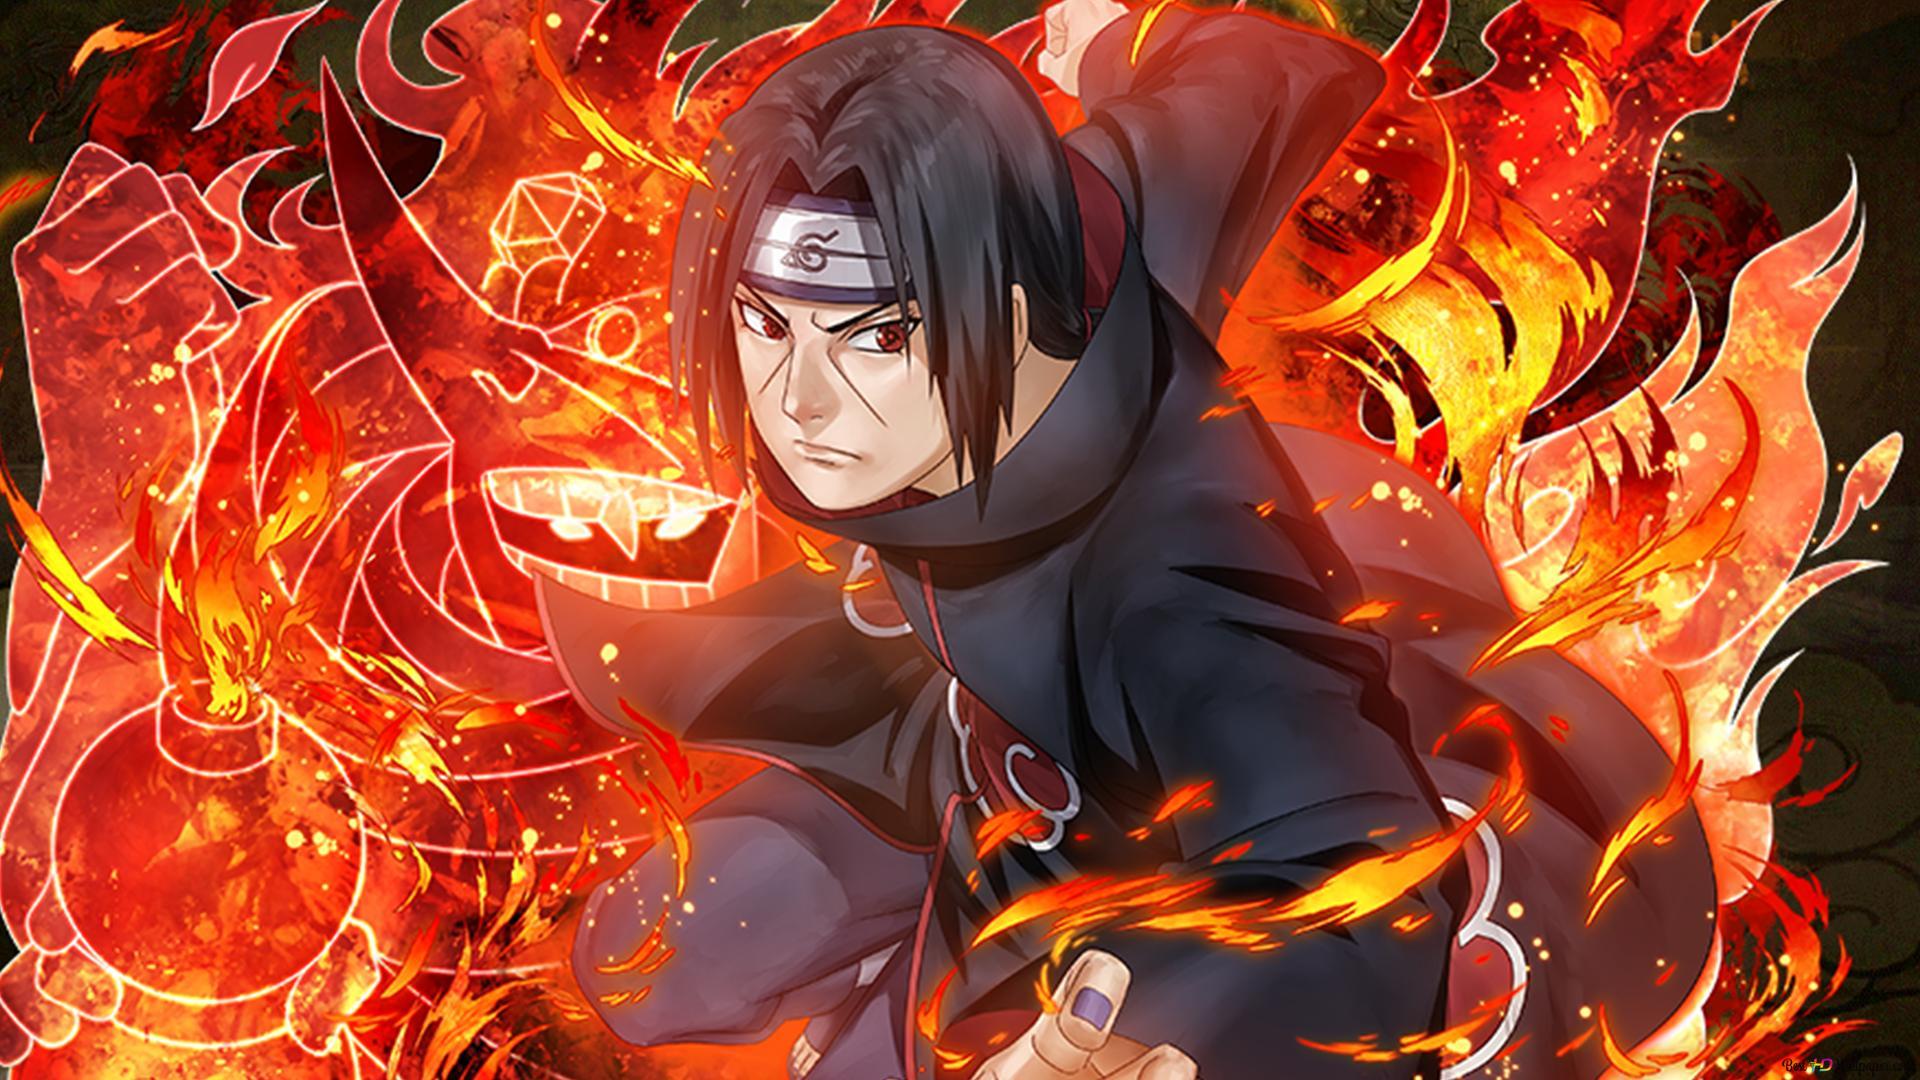 Itachi Uchiha Dari Naruto Shippuden Untuk Desktop Unduhan Wallpaper Hd